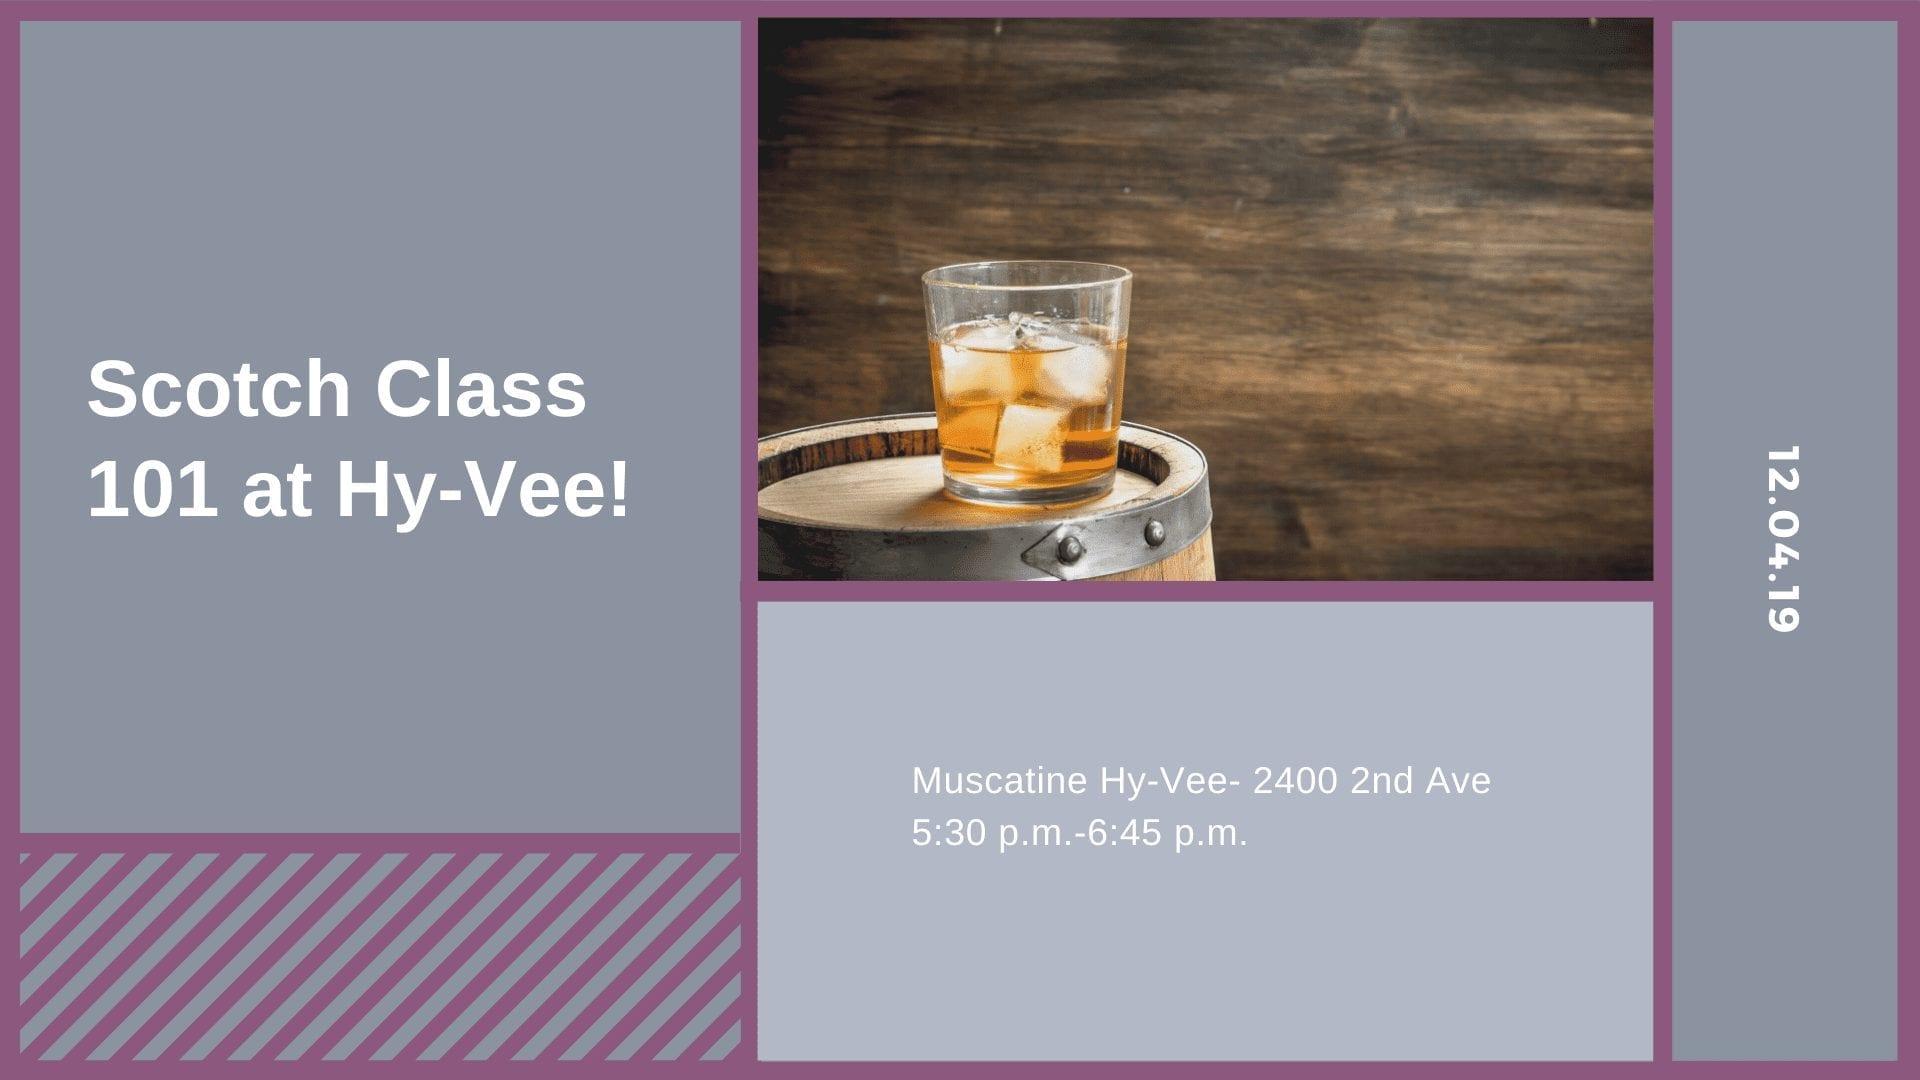 Scotch Class 101 at Hy-Vee!